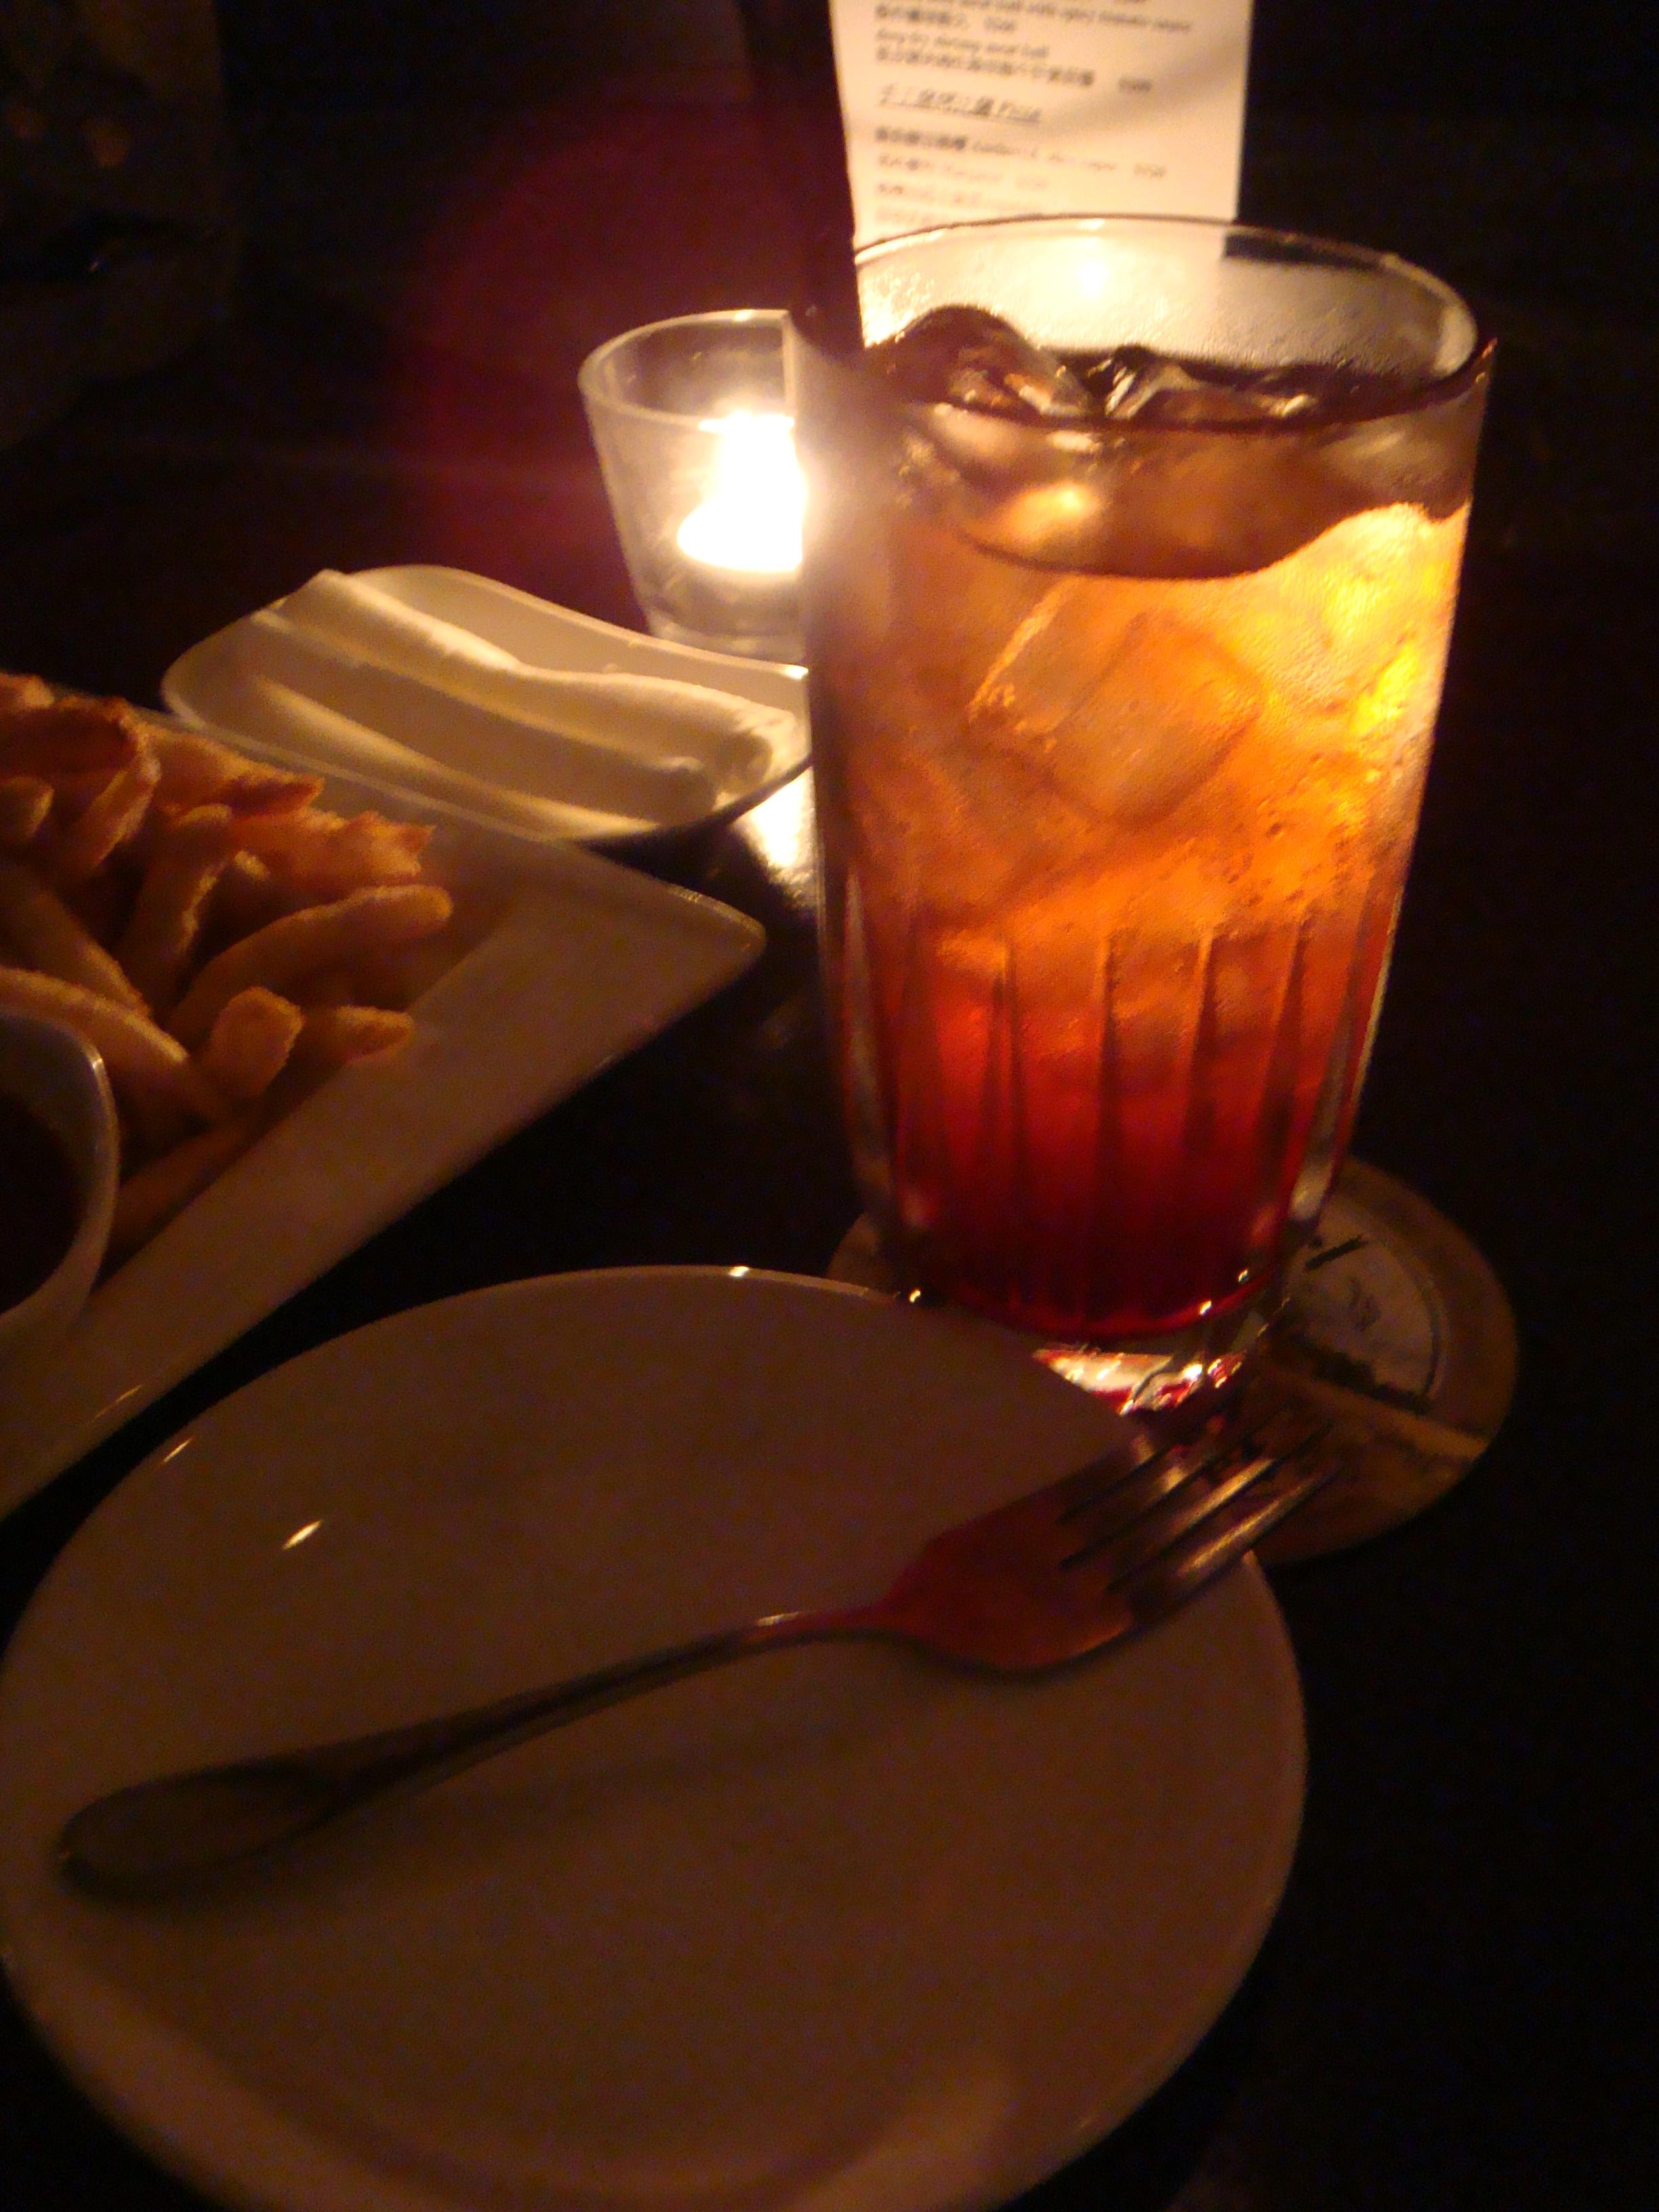 20110218-0219Marsalis Bar 馬沙里斯爵士酒館 皮靴男(Pac Man)無酒精飲料